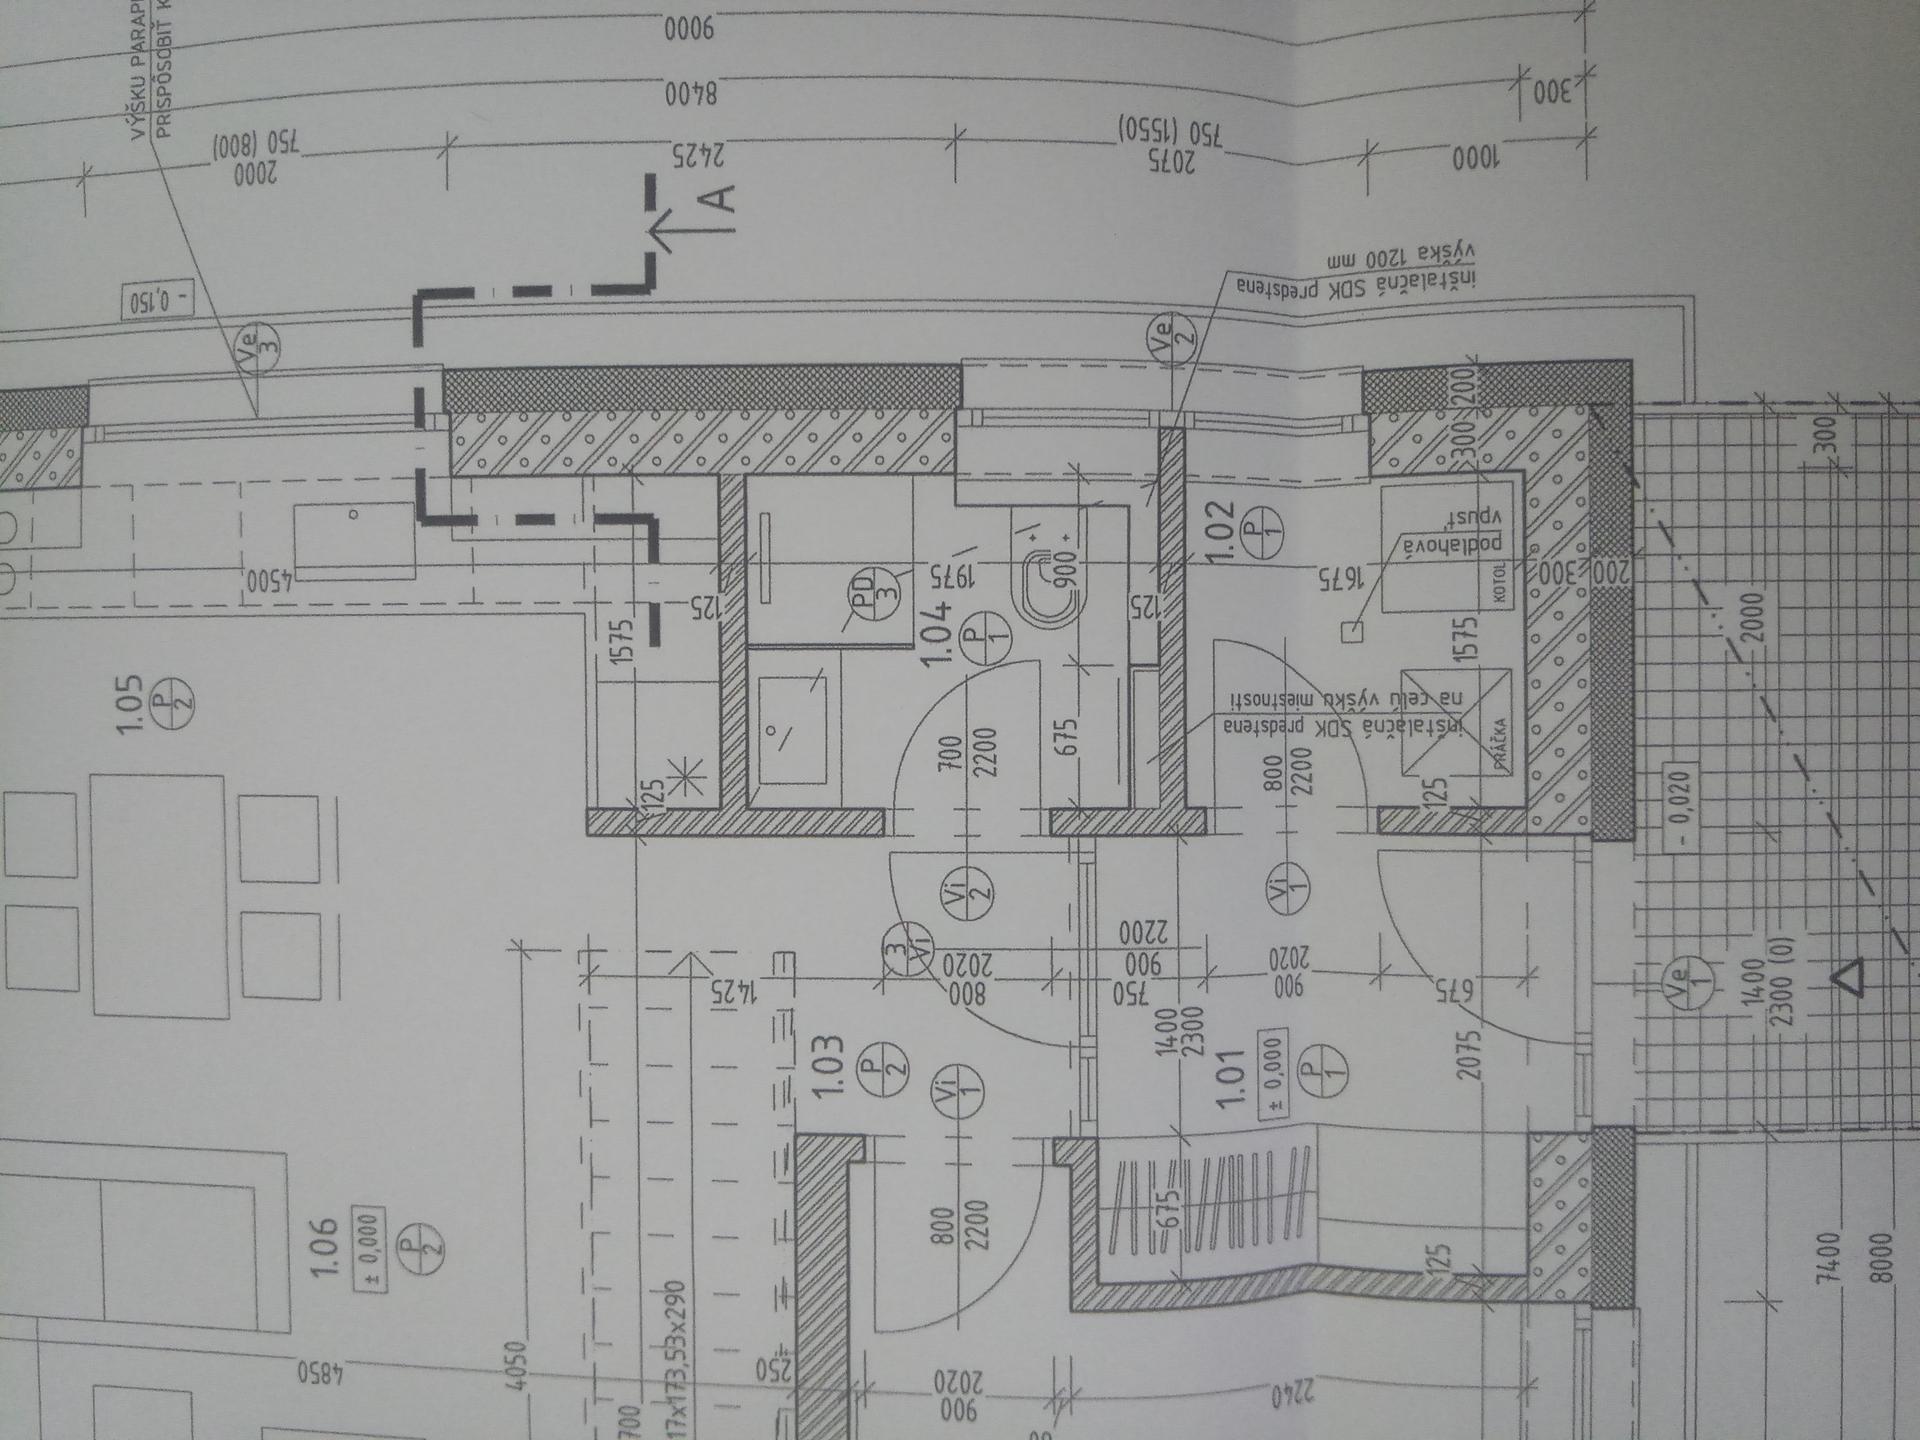 Zdravím...ideme stavať dom.. mám... - Obrázok č. 1